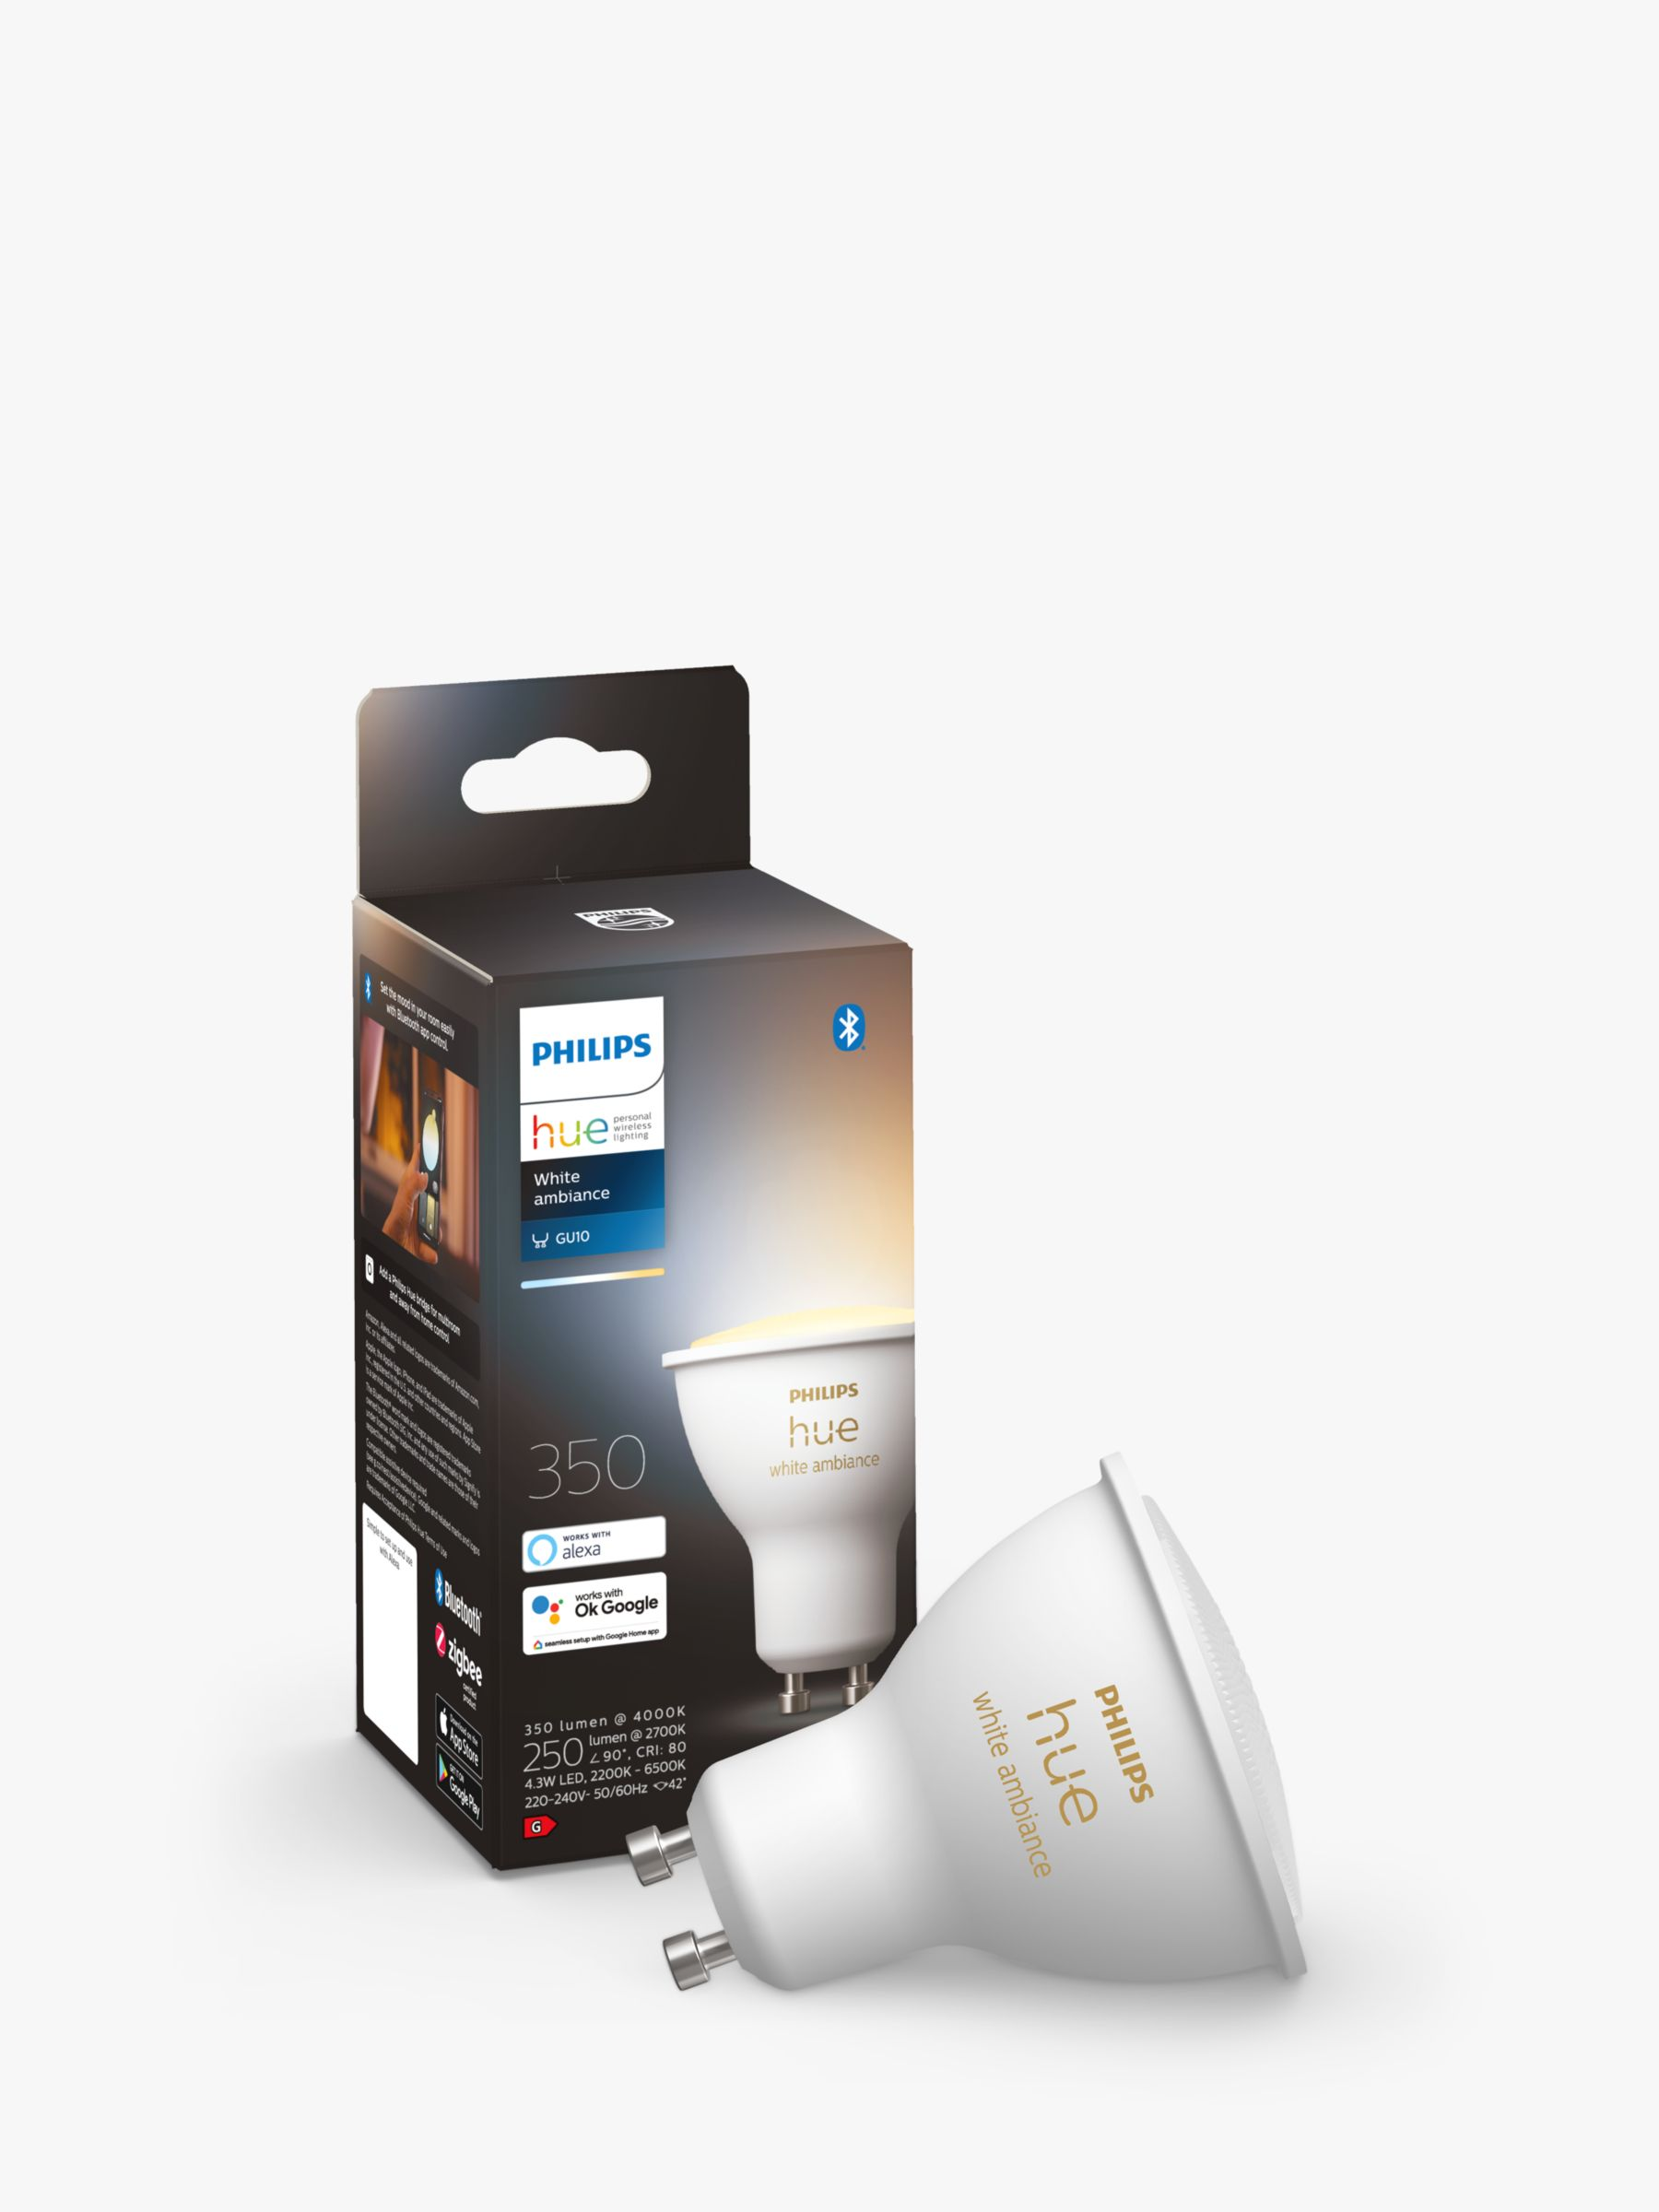 Philips Philips Hue White Ambiance Wireless Lighting LED Light Bulb with Bluetooth, 5W GU10 Bulb, Single